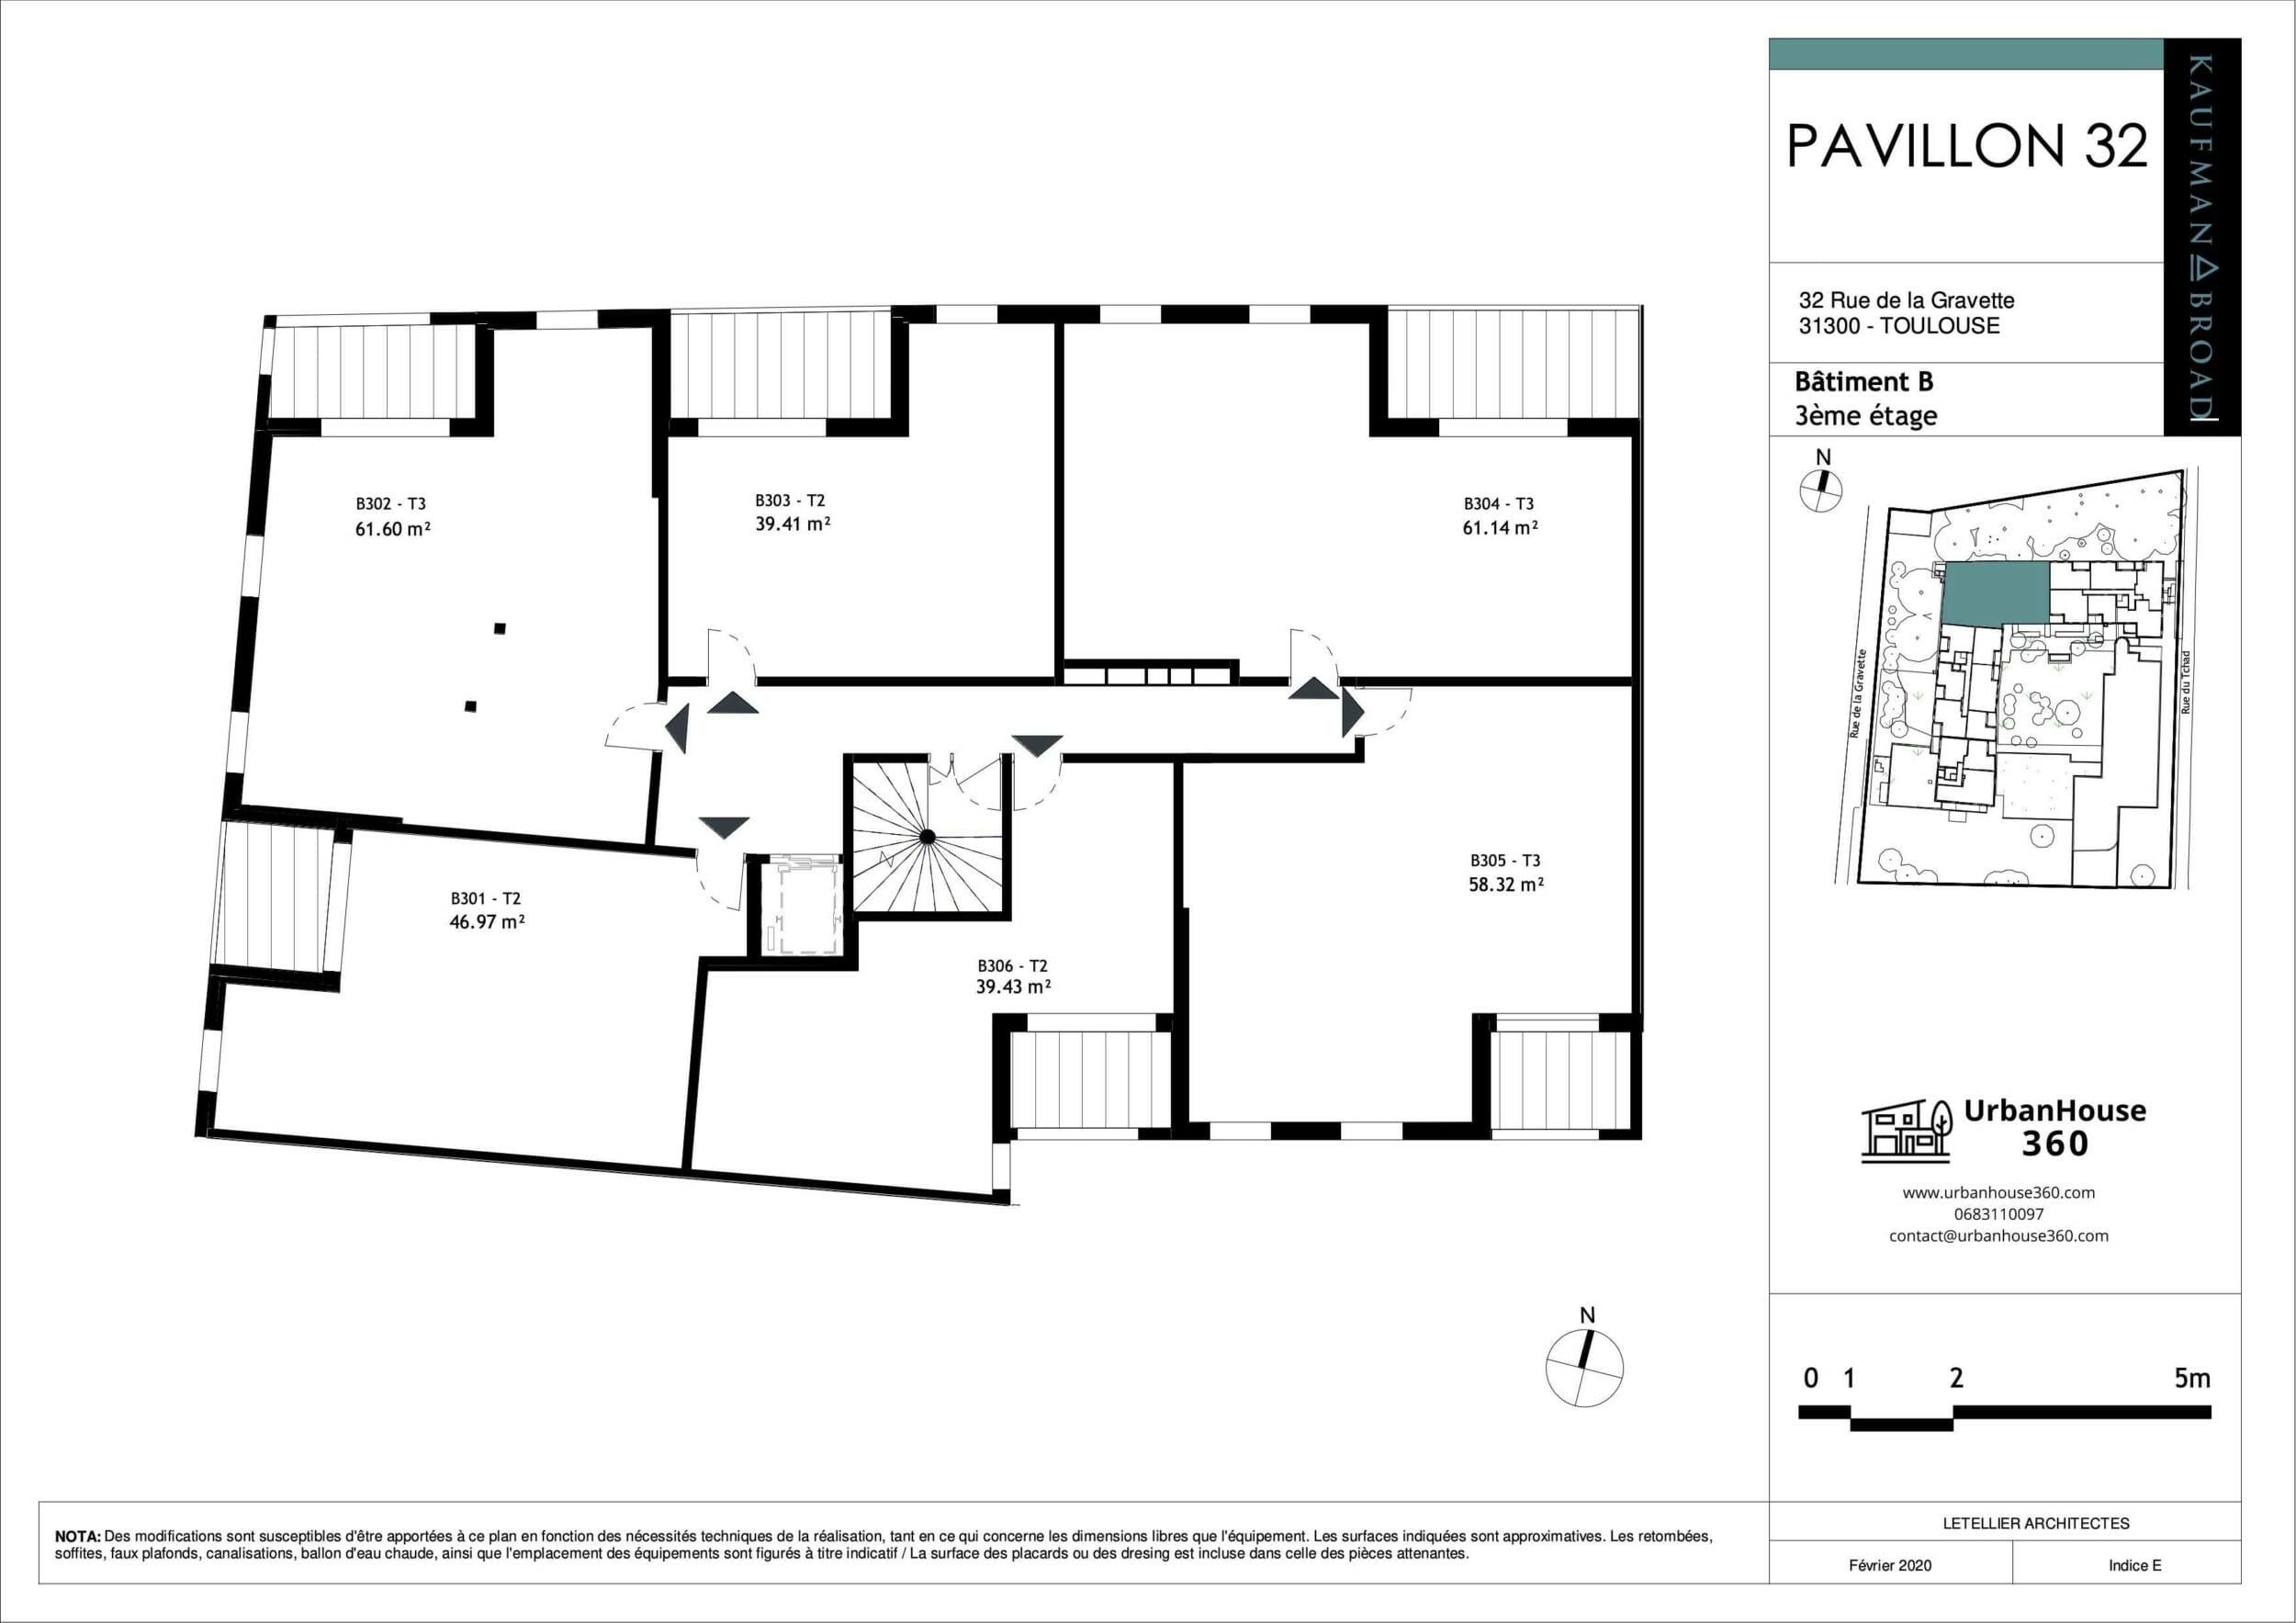 UrbanHouse360-Pavillon32-B_R+3_ind E 2